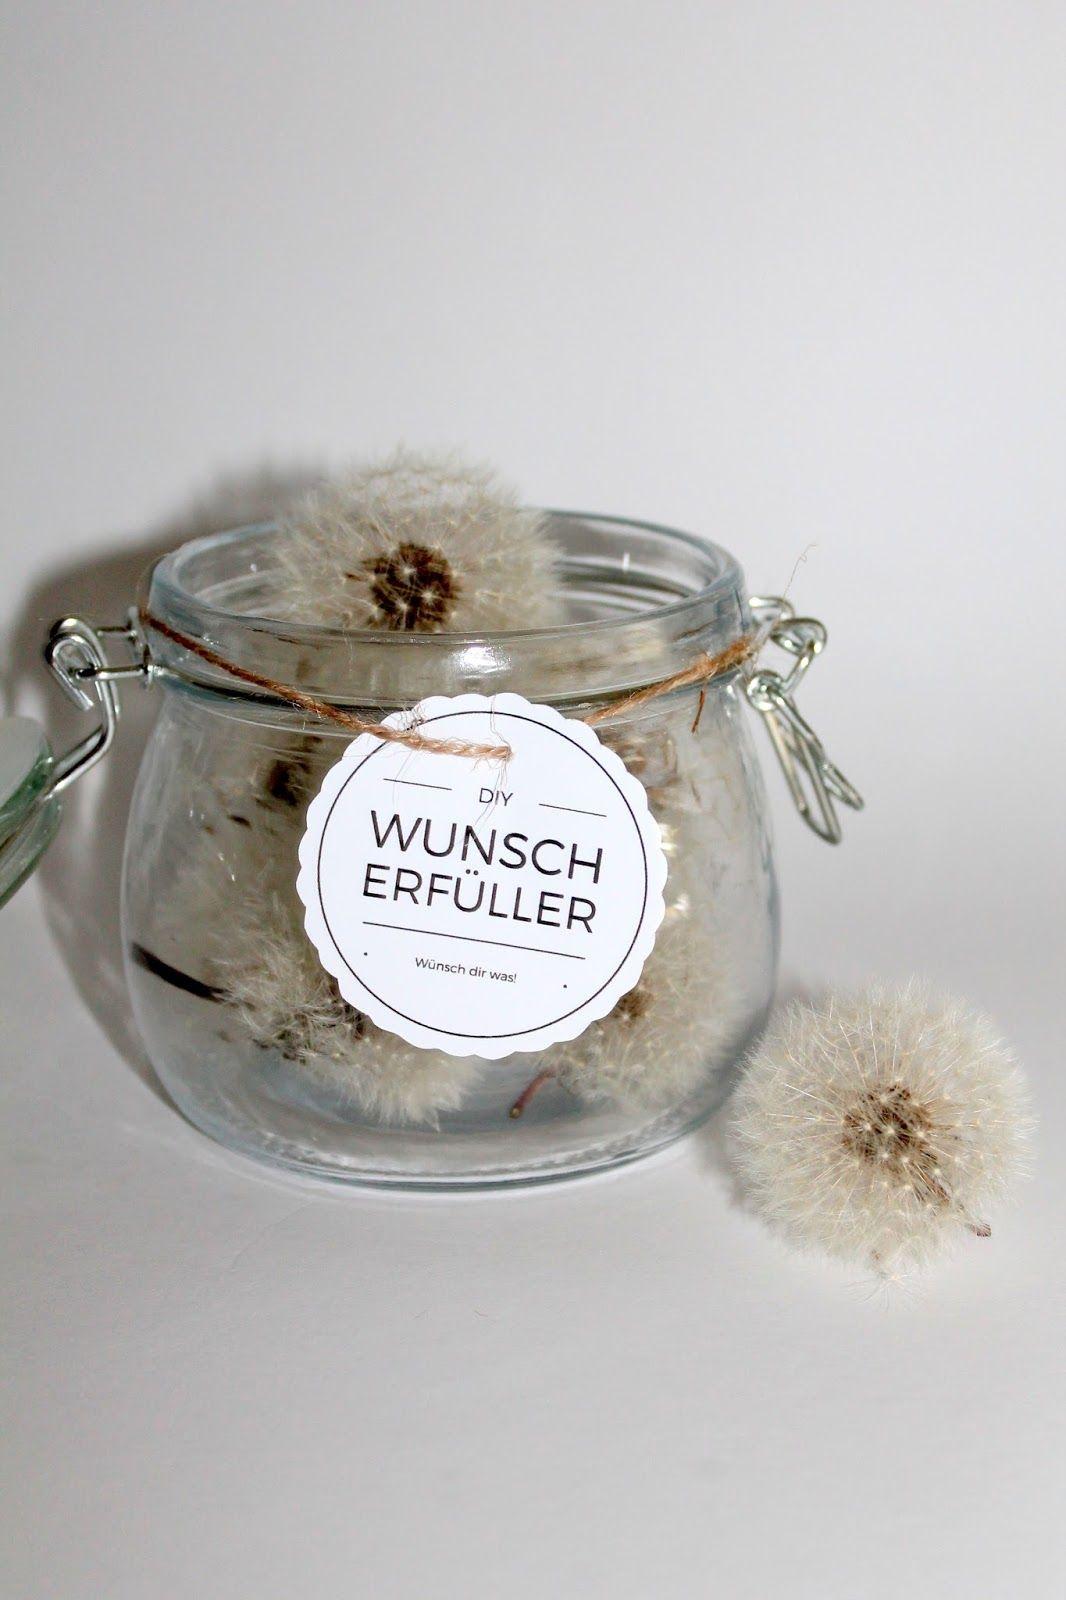 Diy wunscherf ller pusteblume free printable diys and - Pusteblume basteln ...